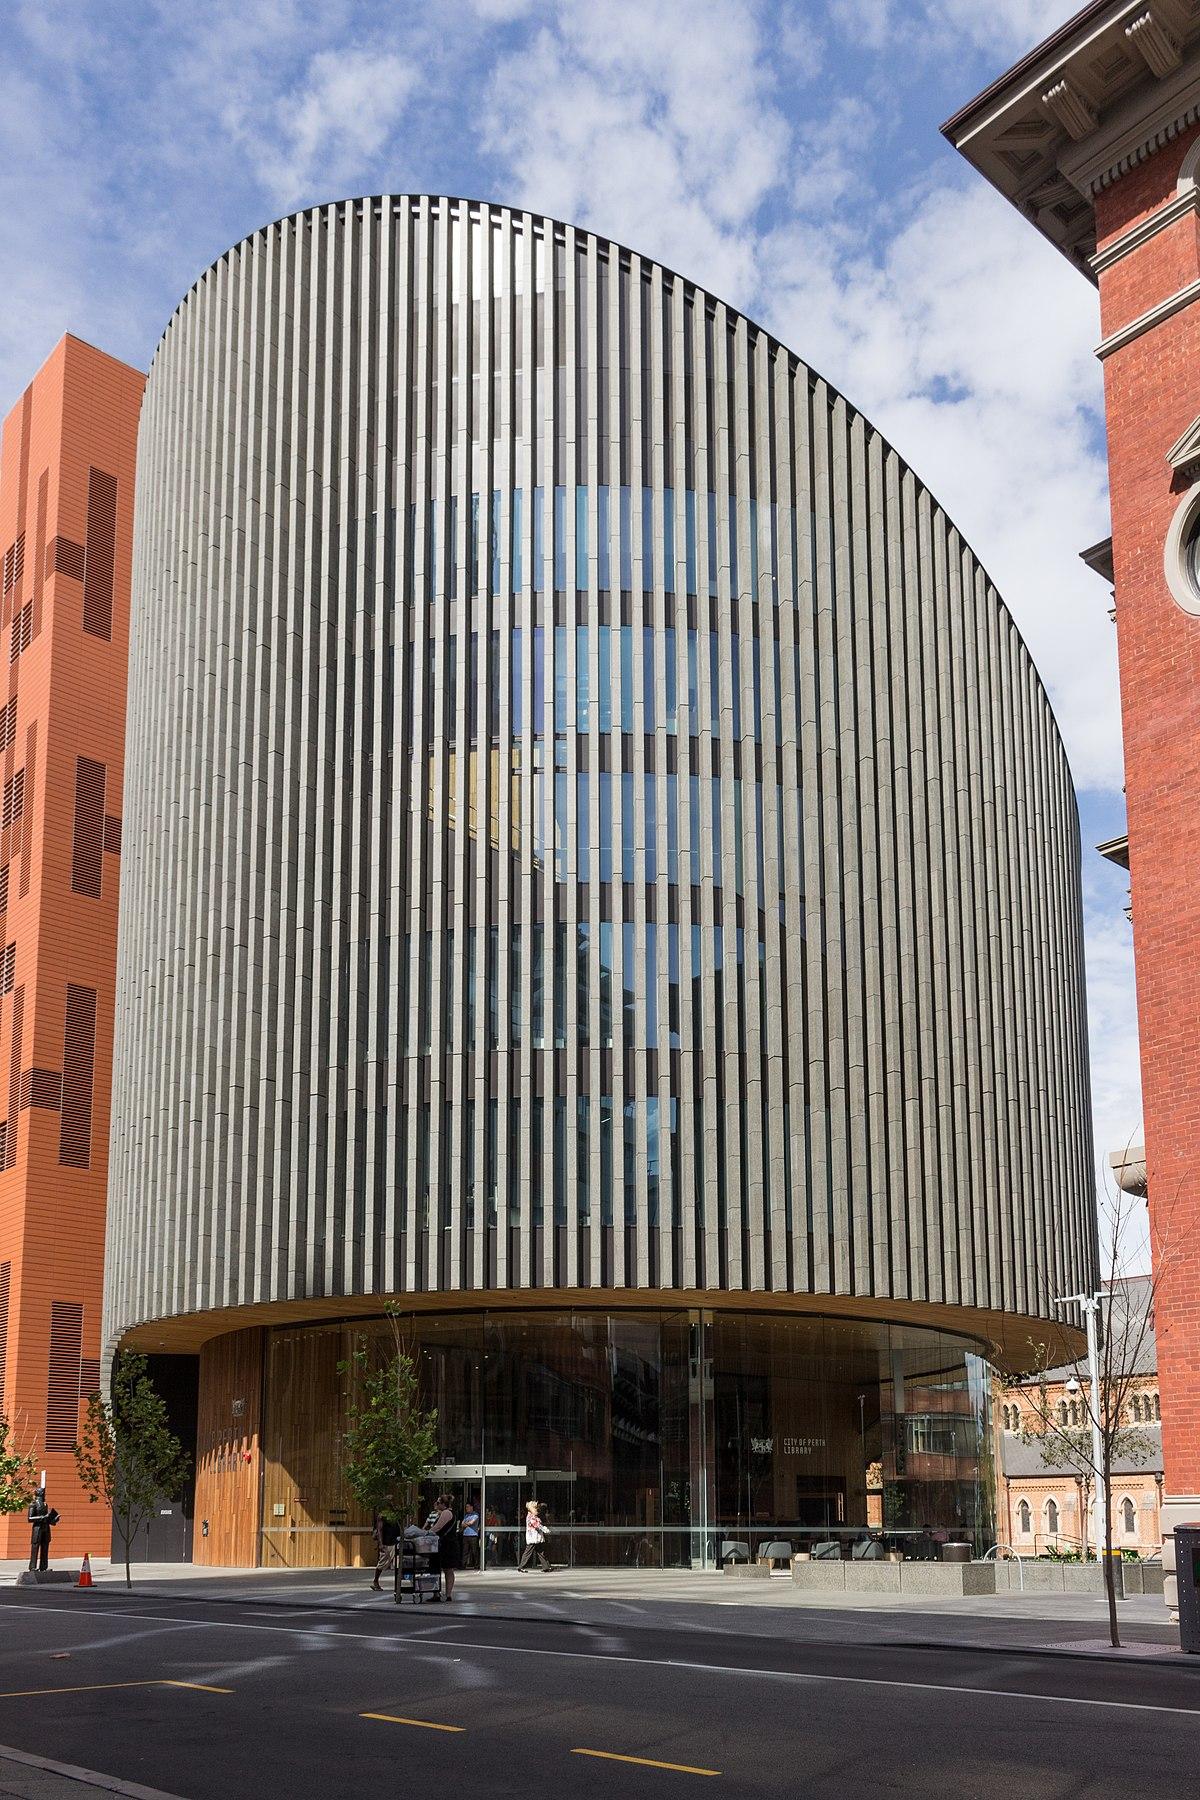 City Of Perth Library Wikipedia